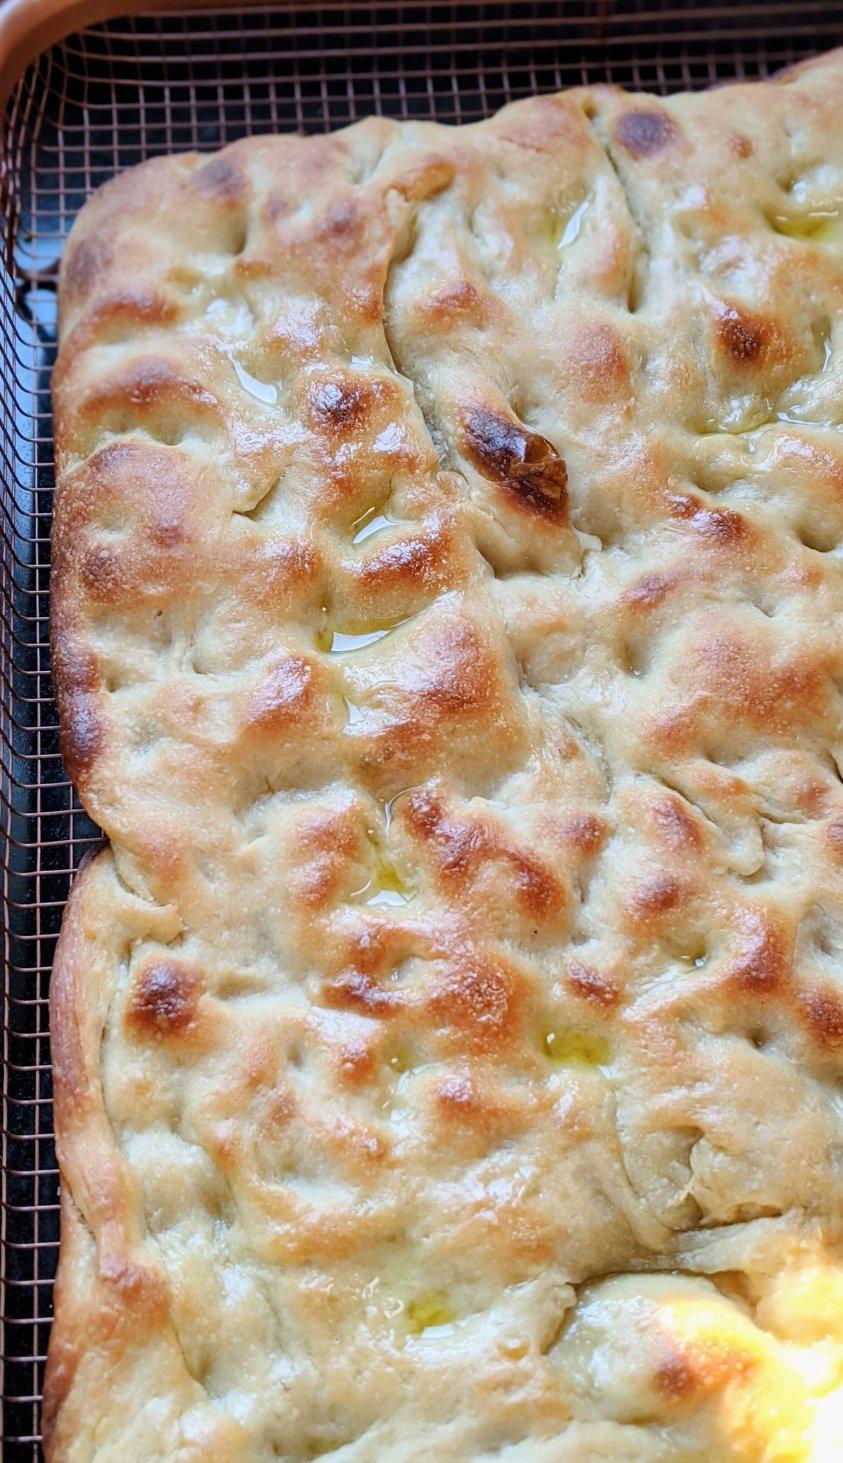 vegan olive oil bread recipe egg free dairy free focaccia bread with olive oil healthy sourodugh overnight focaccia no knead